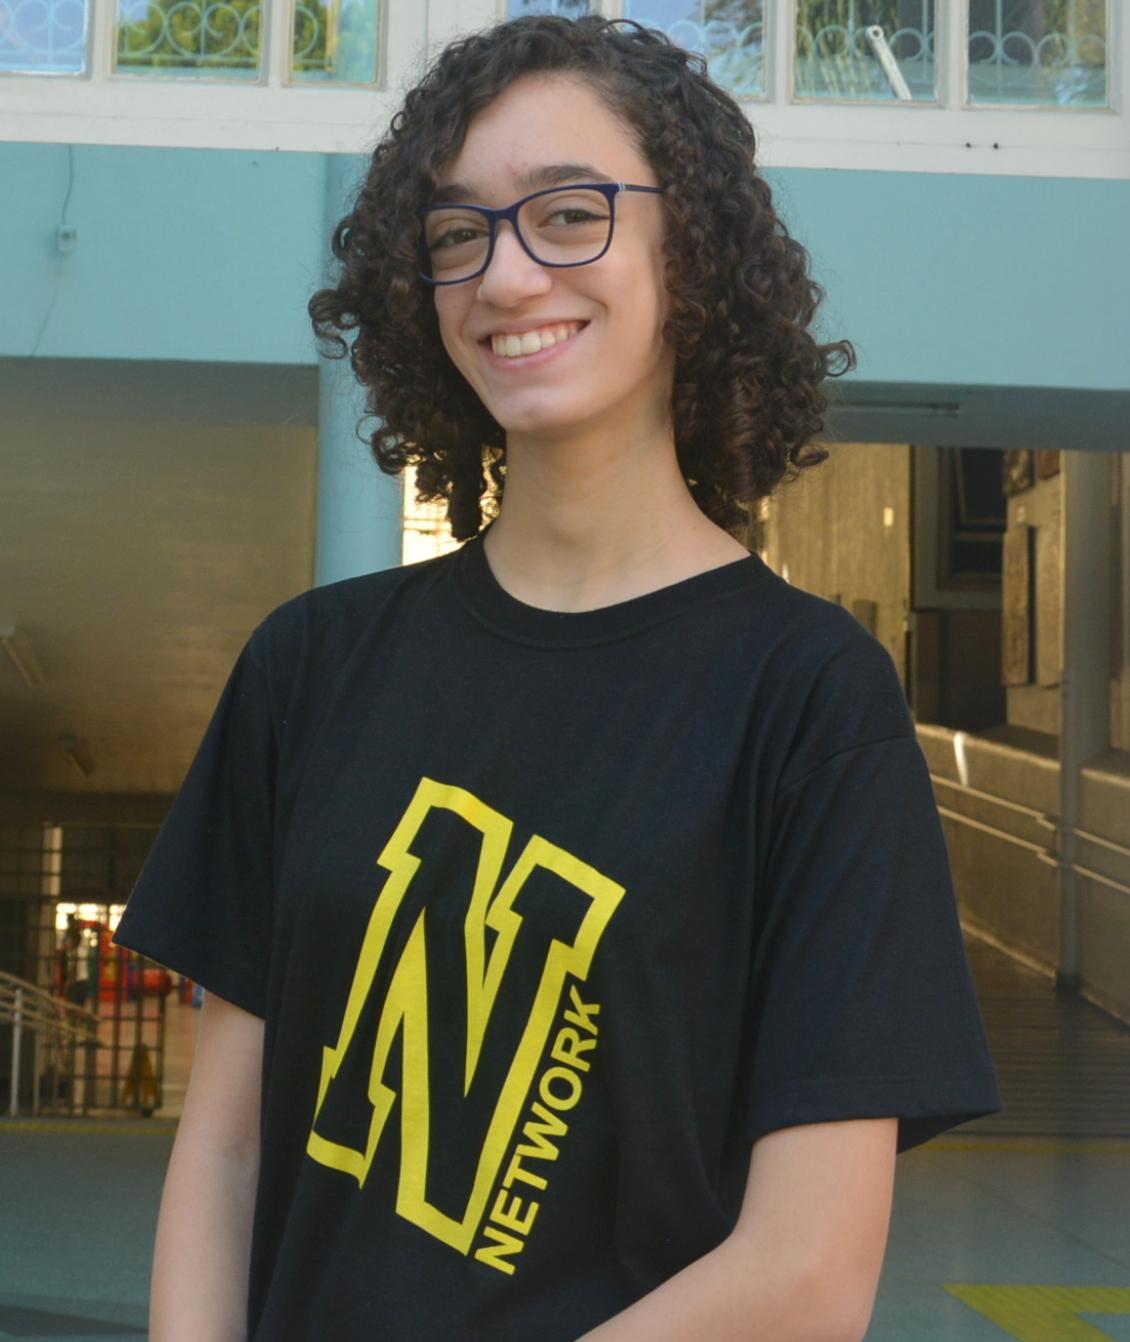 Sofia Tognella pretende se formar em Bilogia